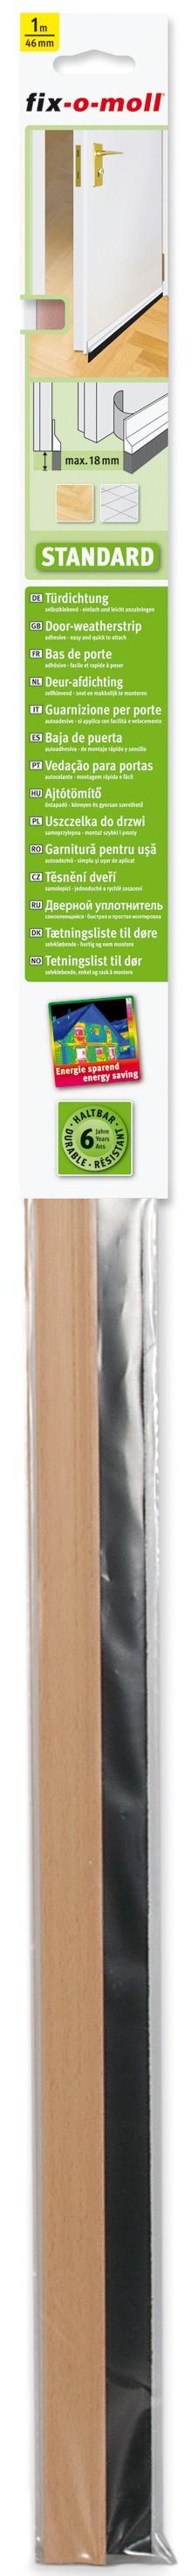 Türdichtung Standard fix-o-moll mit Bürste, Buche, 1m x 46mm